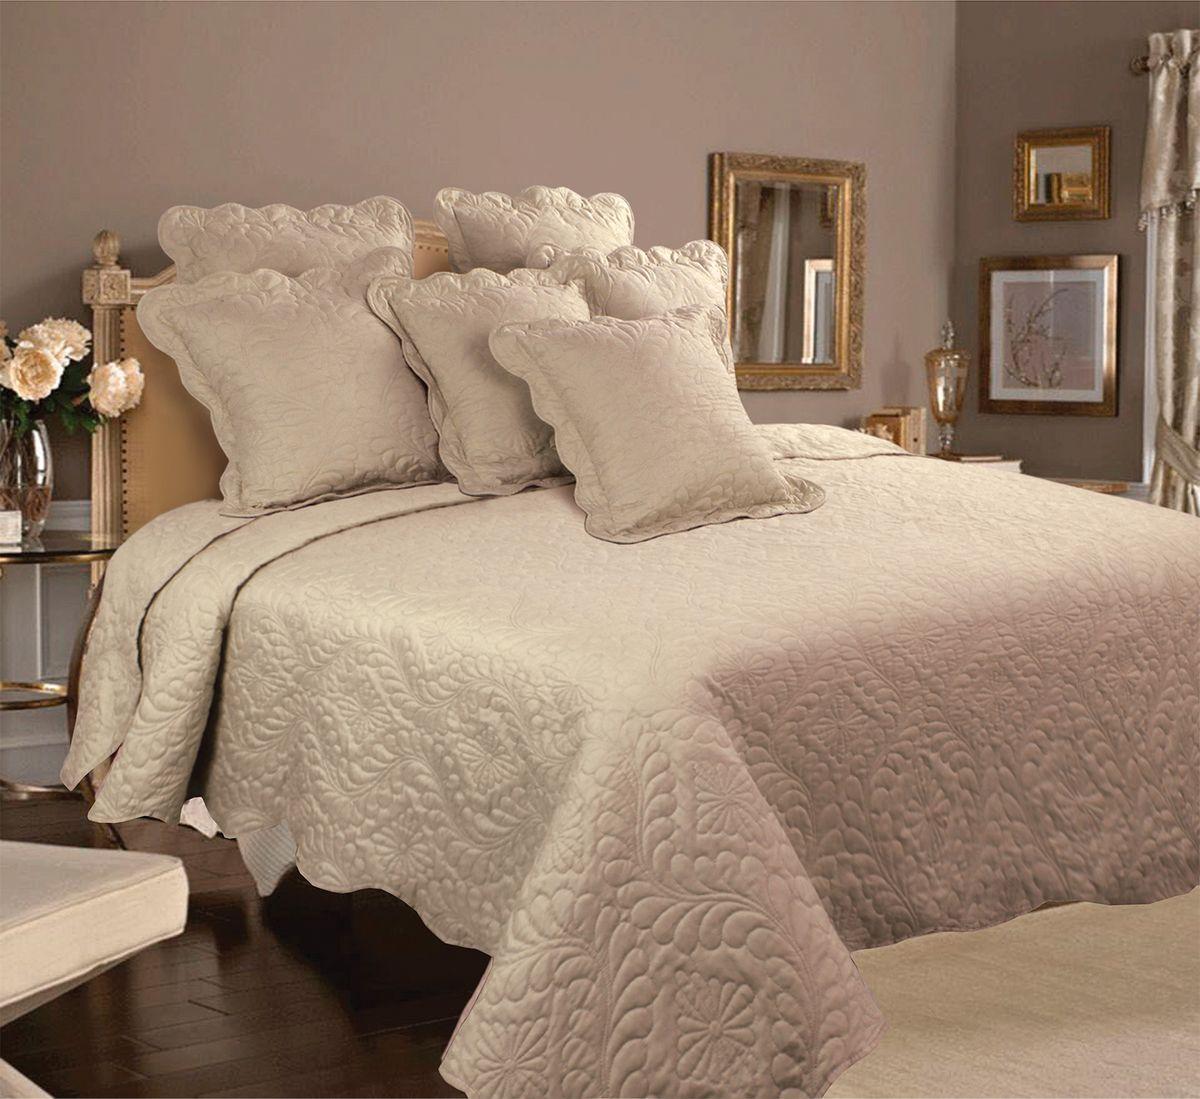 Комплект для спальни Mona Liza Royal Latte: покрывало 240 см х 260 см, 2 наволочки 40 см х 40 см, цвет: латте